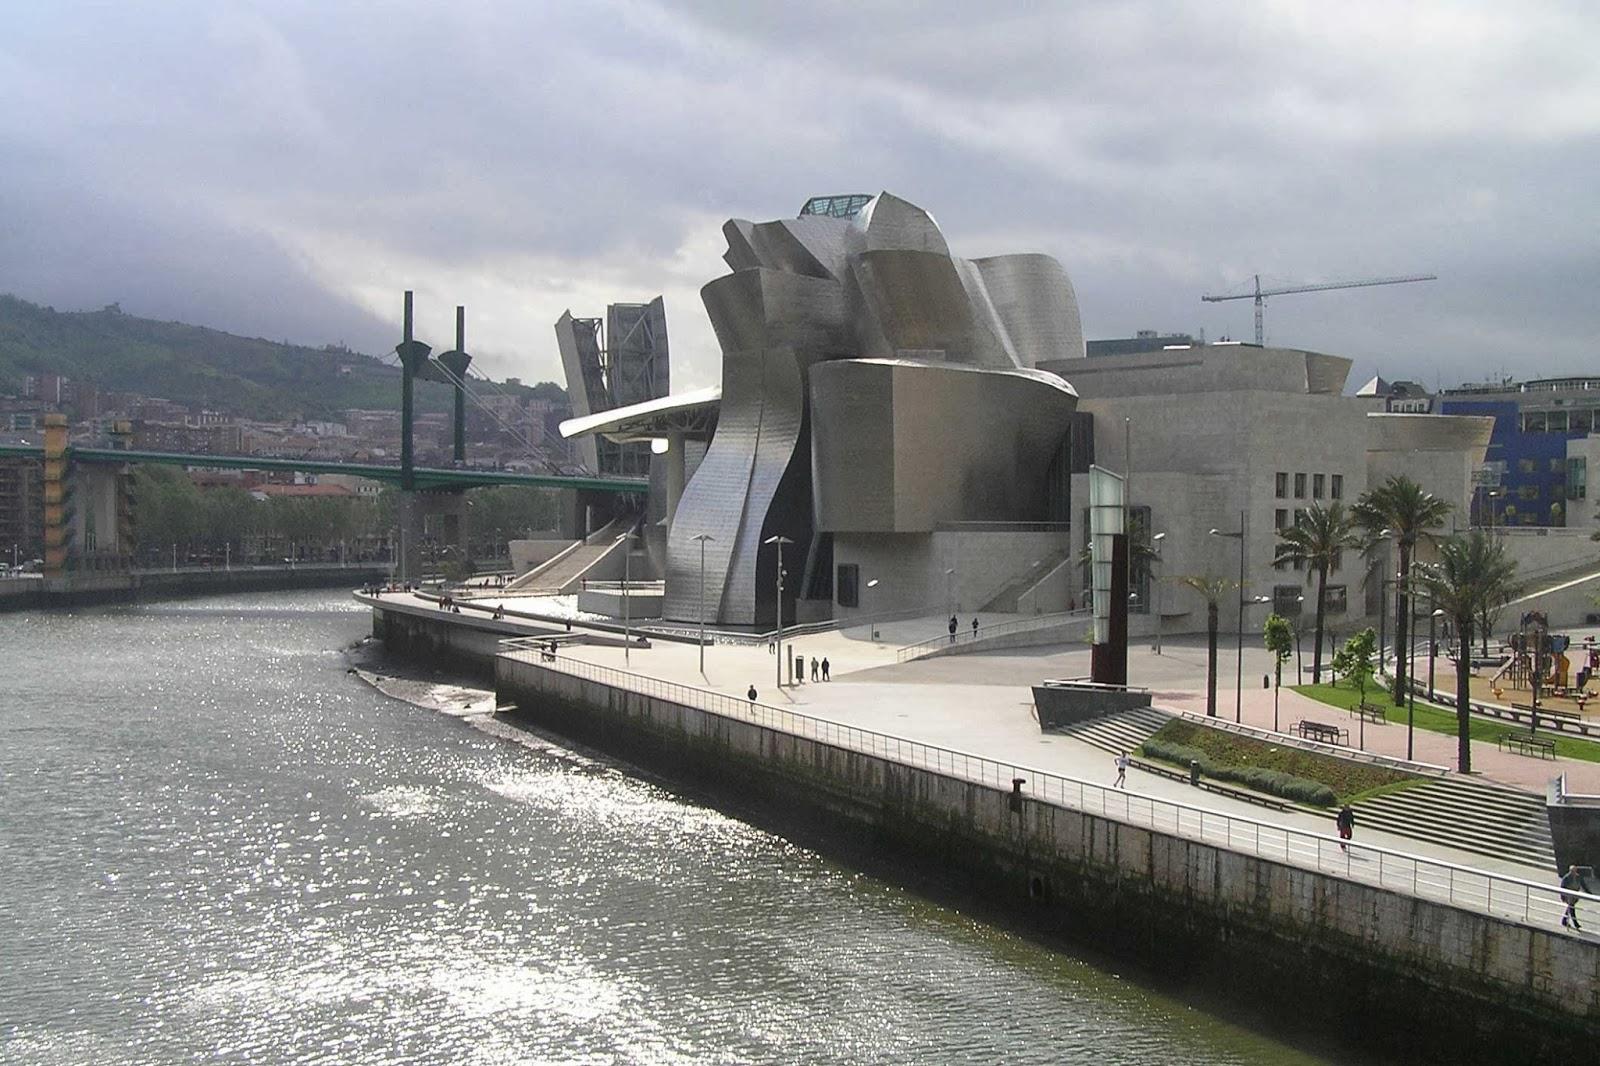 Guggenheim de Bilbao y Puente de La Salve.